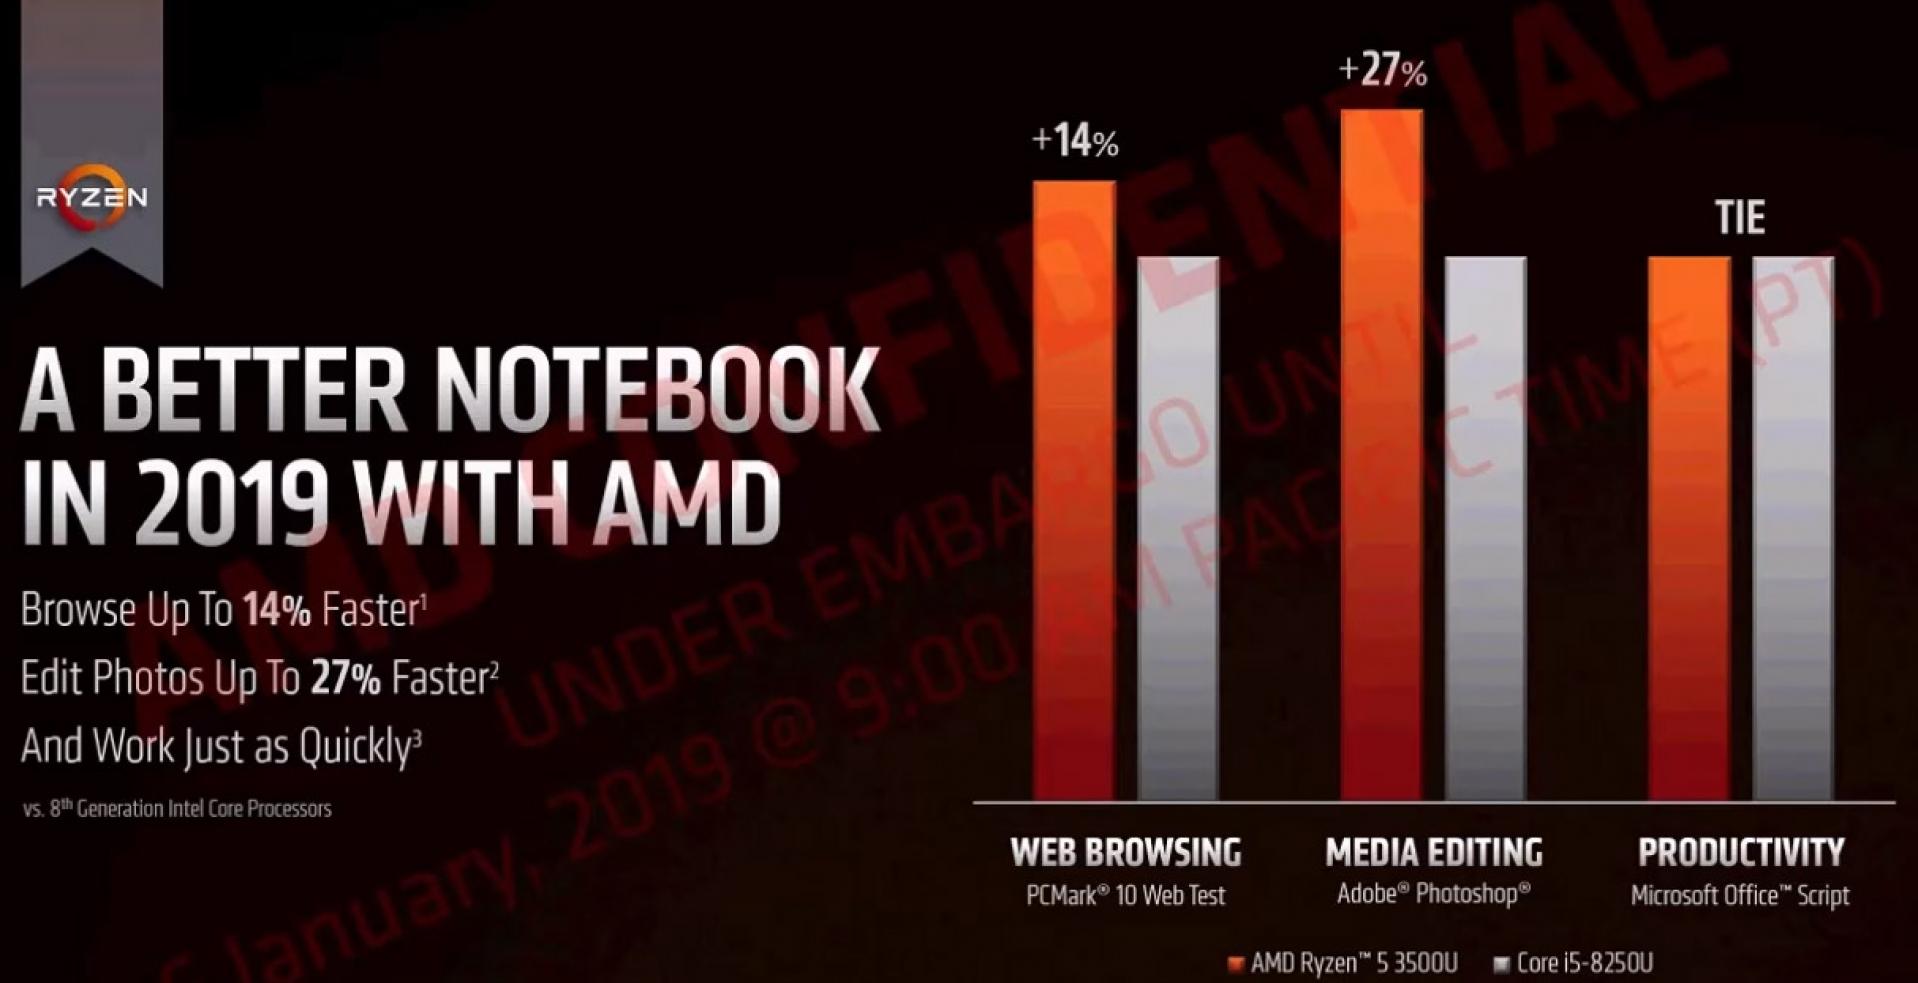 AMD 3000-series Ryzen Mobile APU Specs Leak - Gaming-Grade Notebook